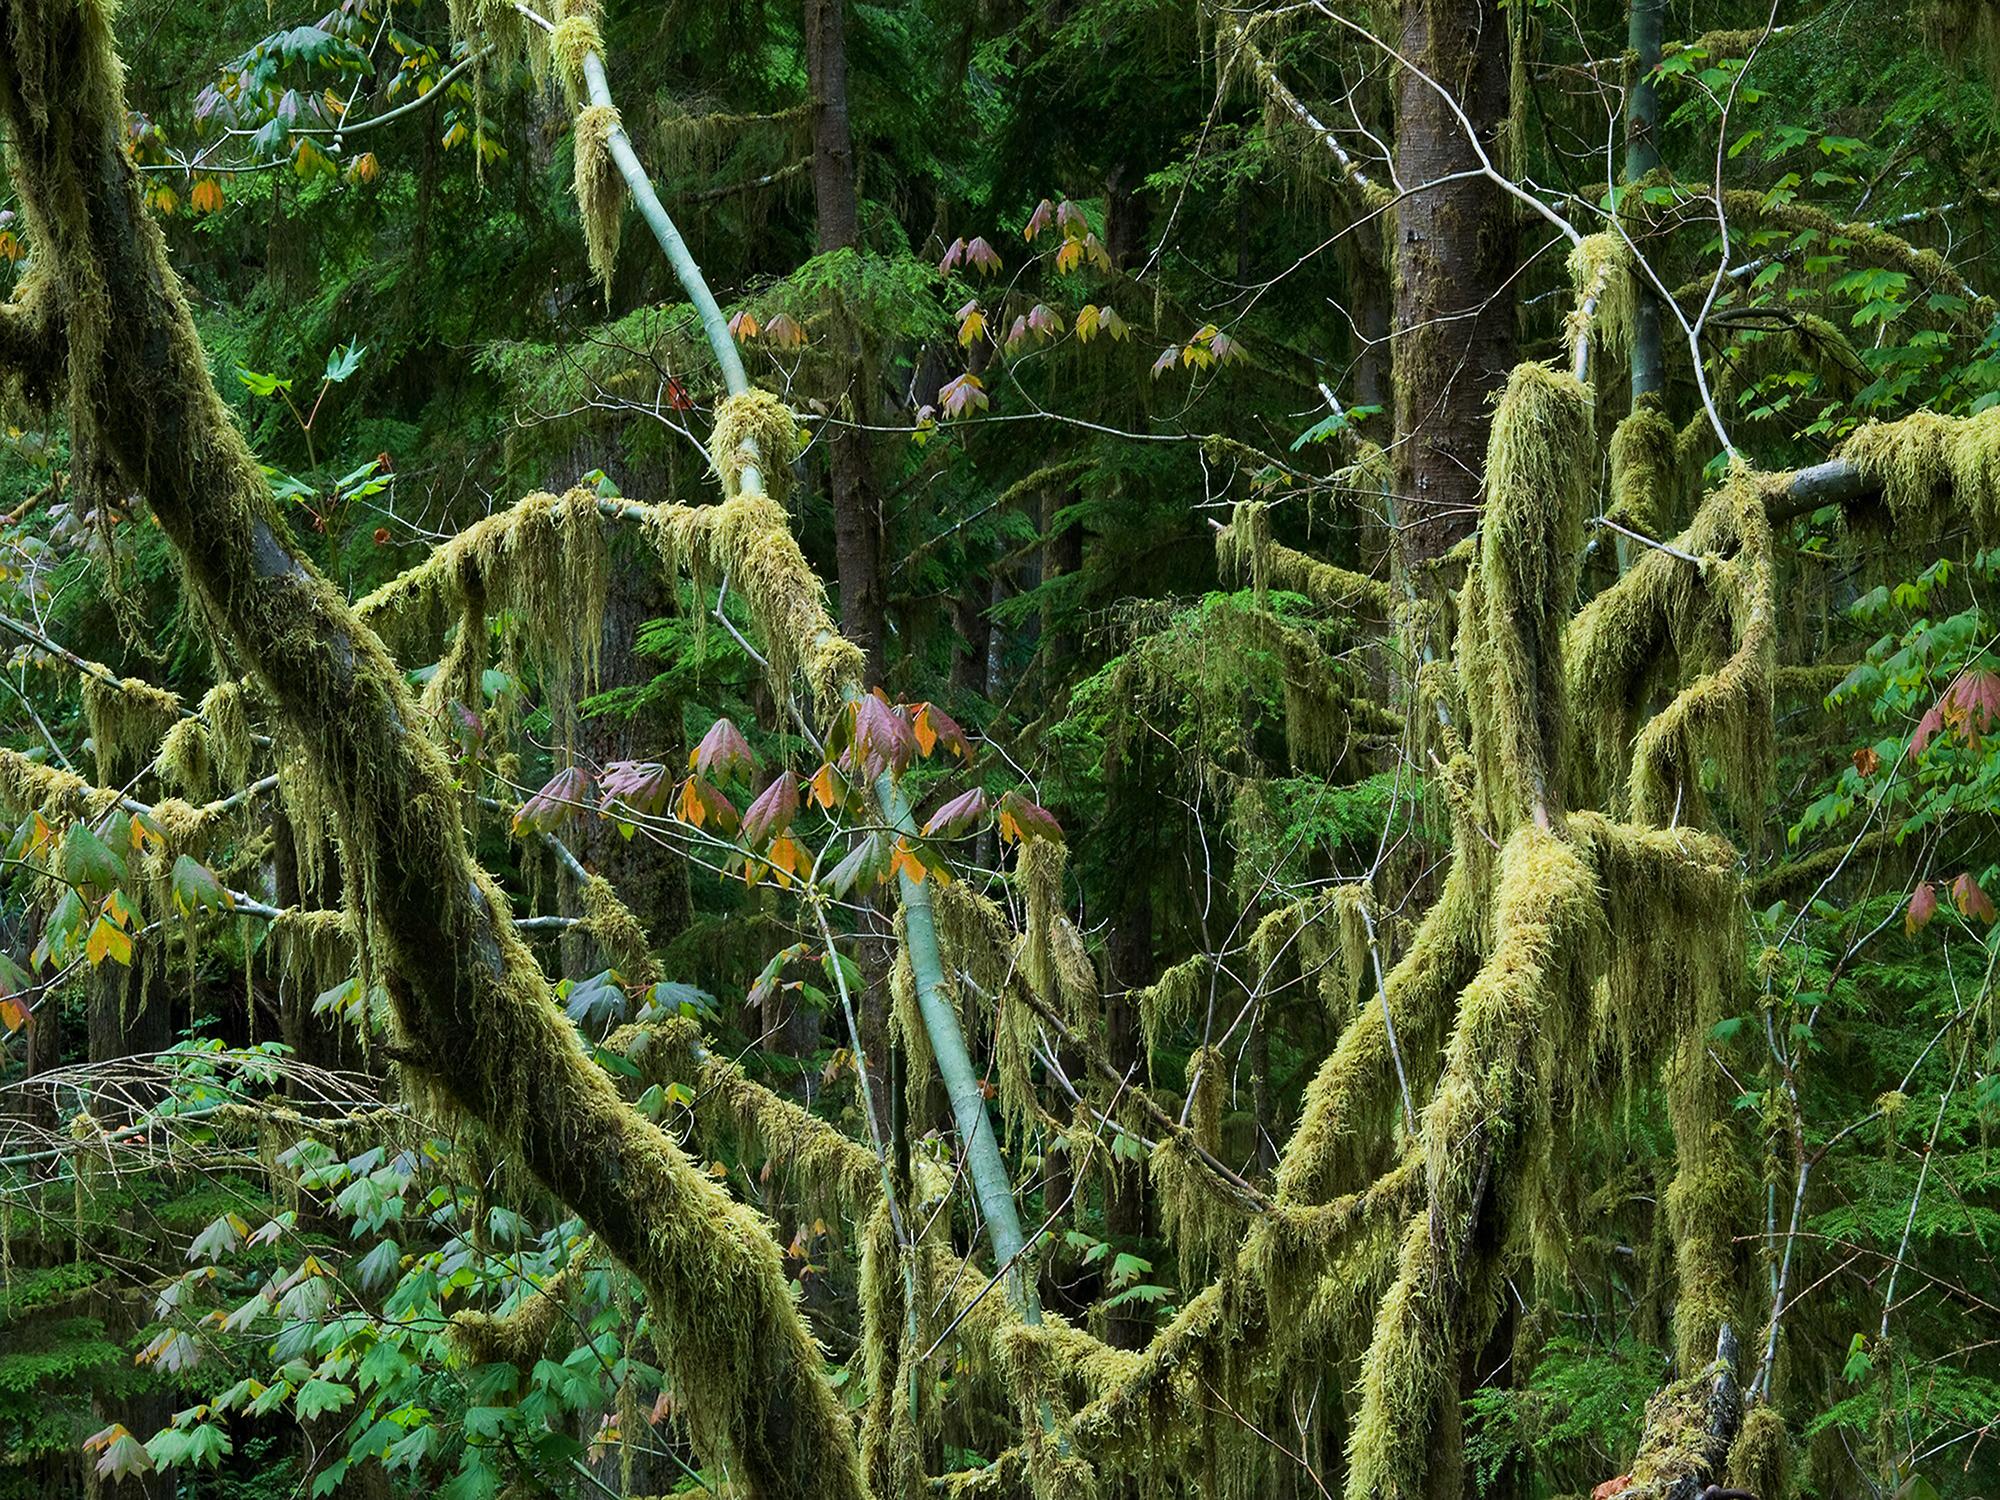 Quinault Rain Forest No. 2